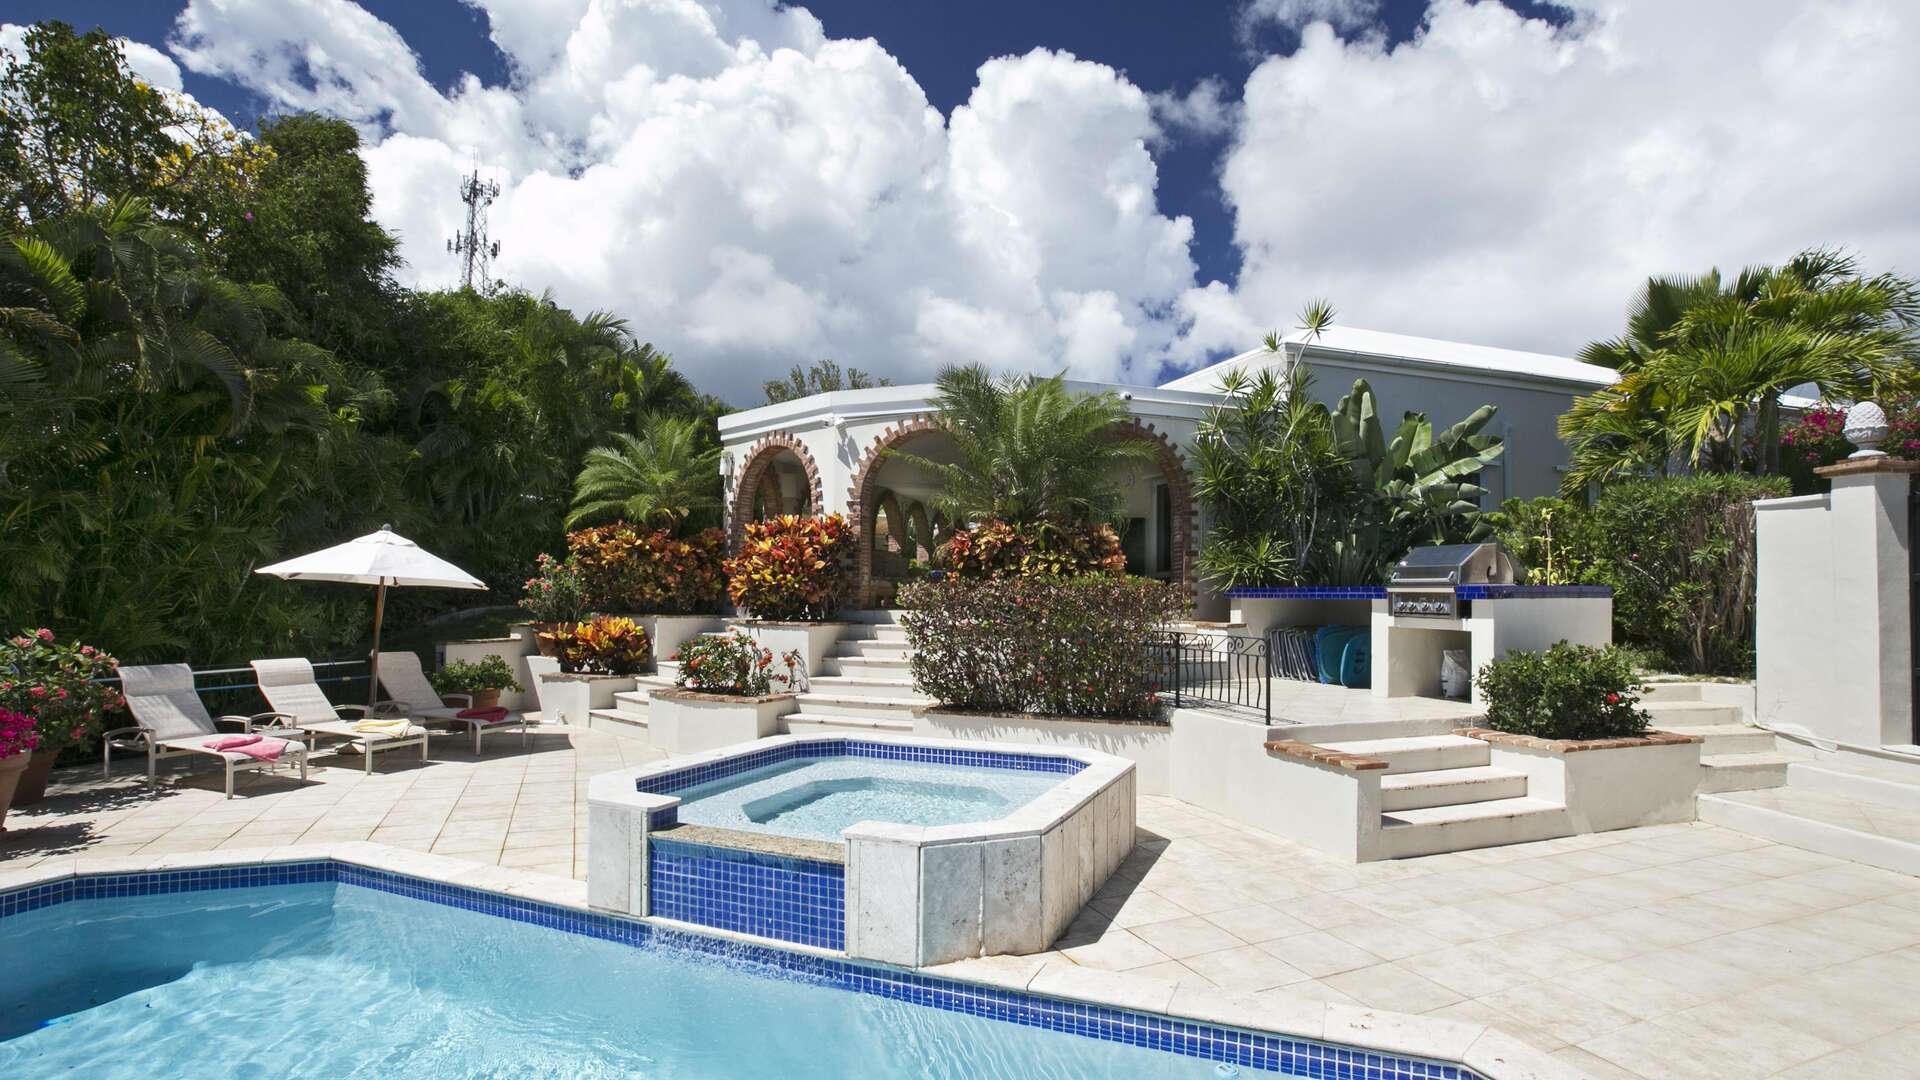 Luxury villa rentals caribbean - Usvi - St thomas - Northside - Villa Gardenia - Image 1/15